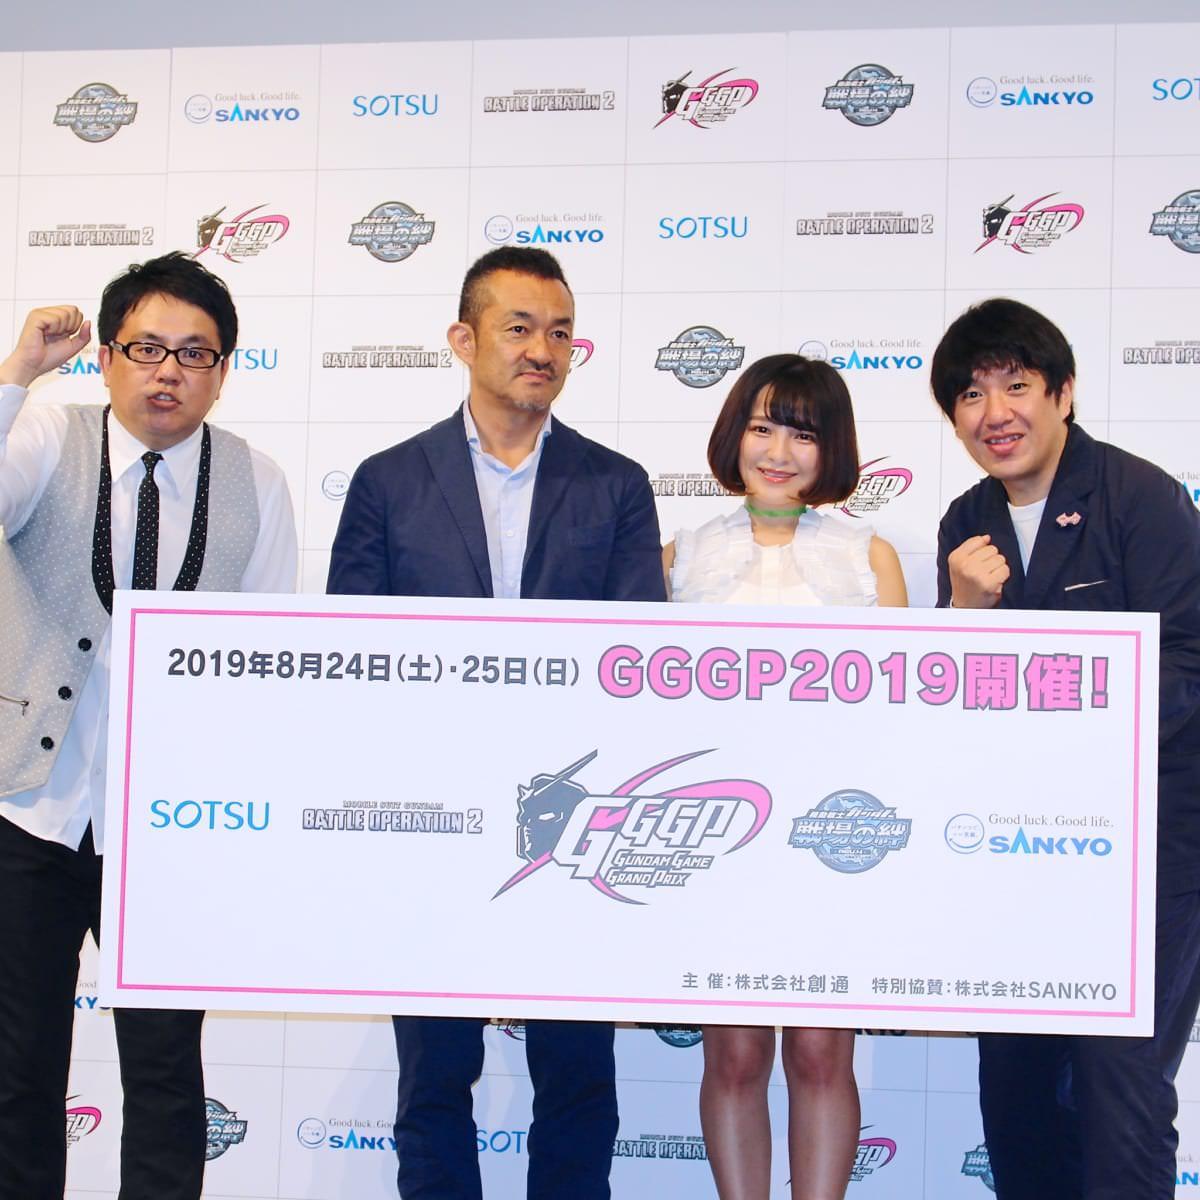 「GGGO2019」大会開催イベント3